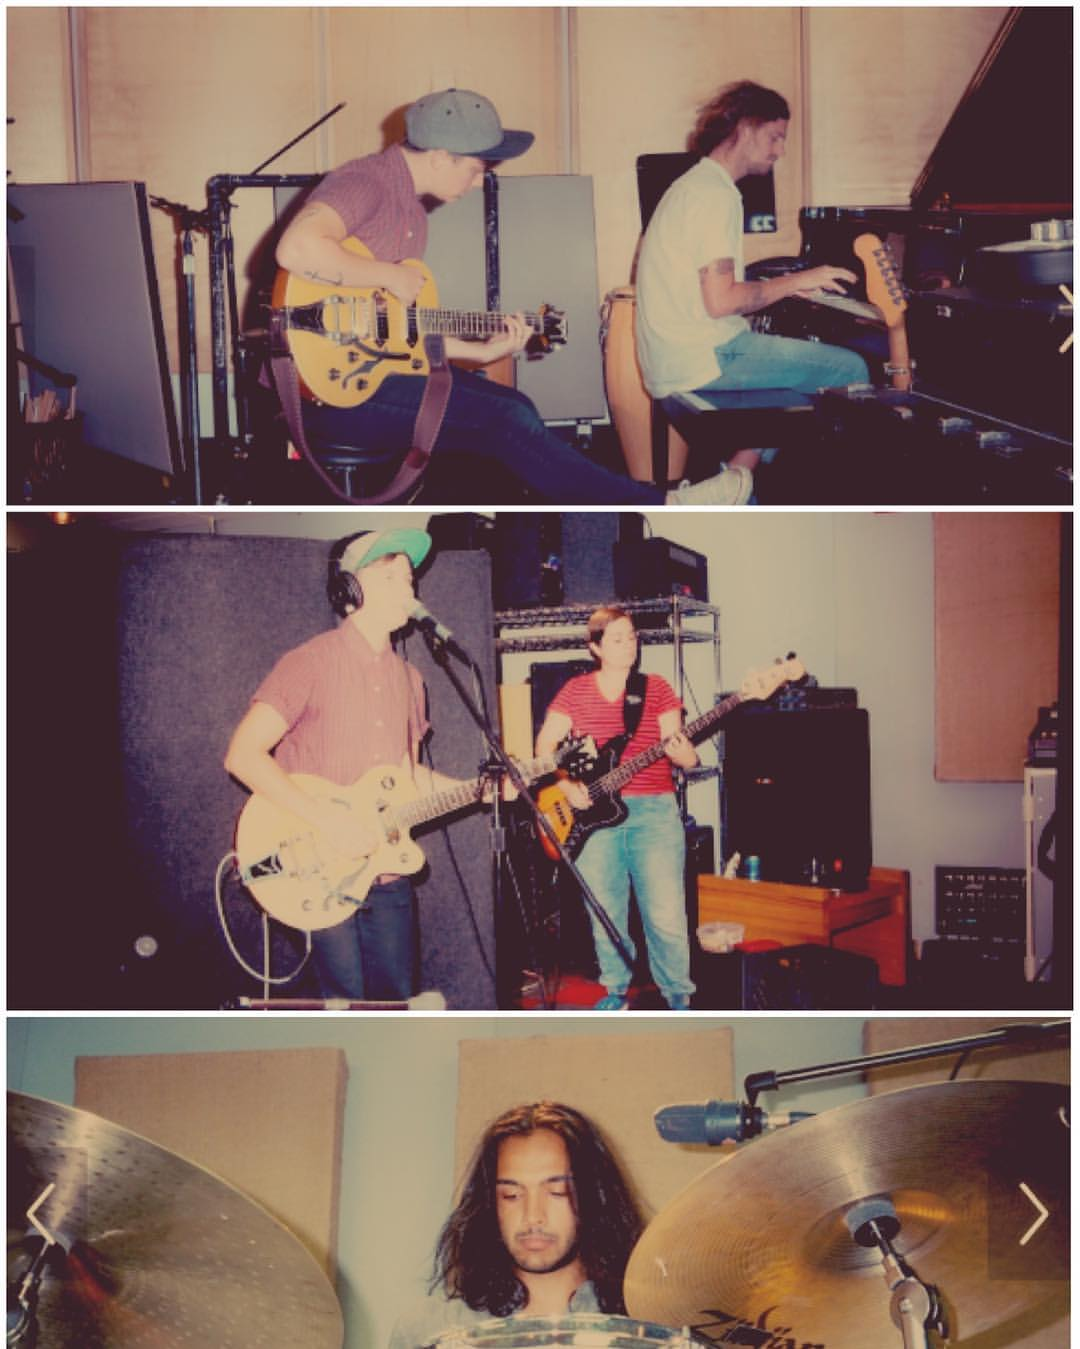 Heart Harbor, Jesse Moore, Julia Rainer, & Keaton Thandi at University of the Arts music studio.